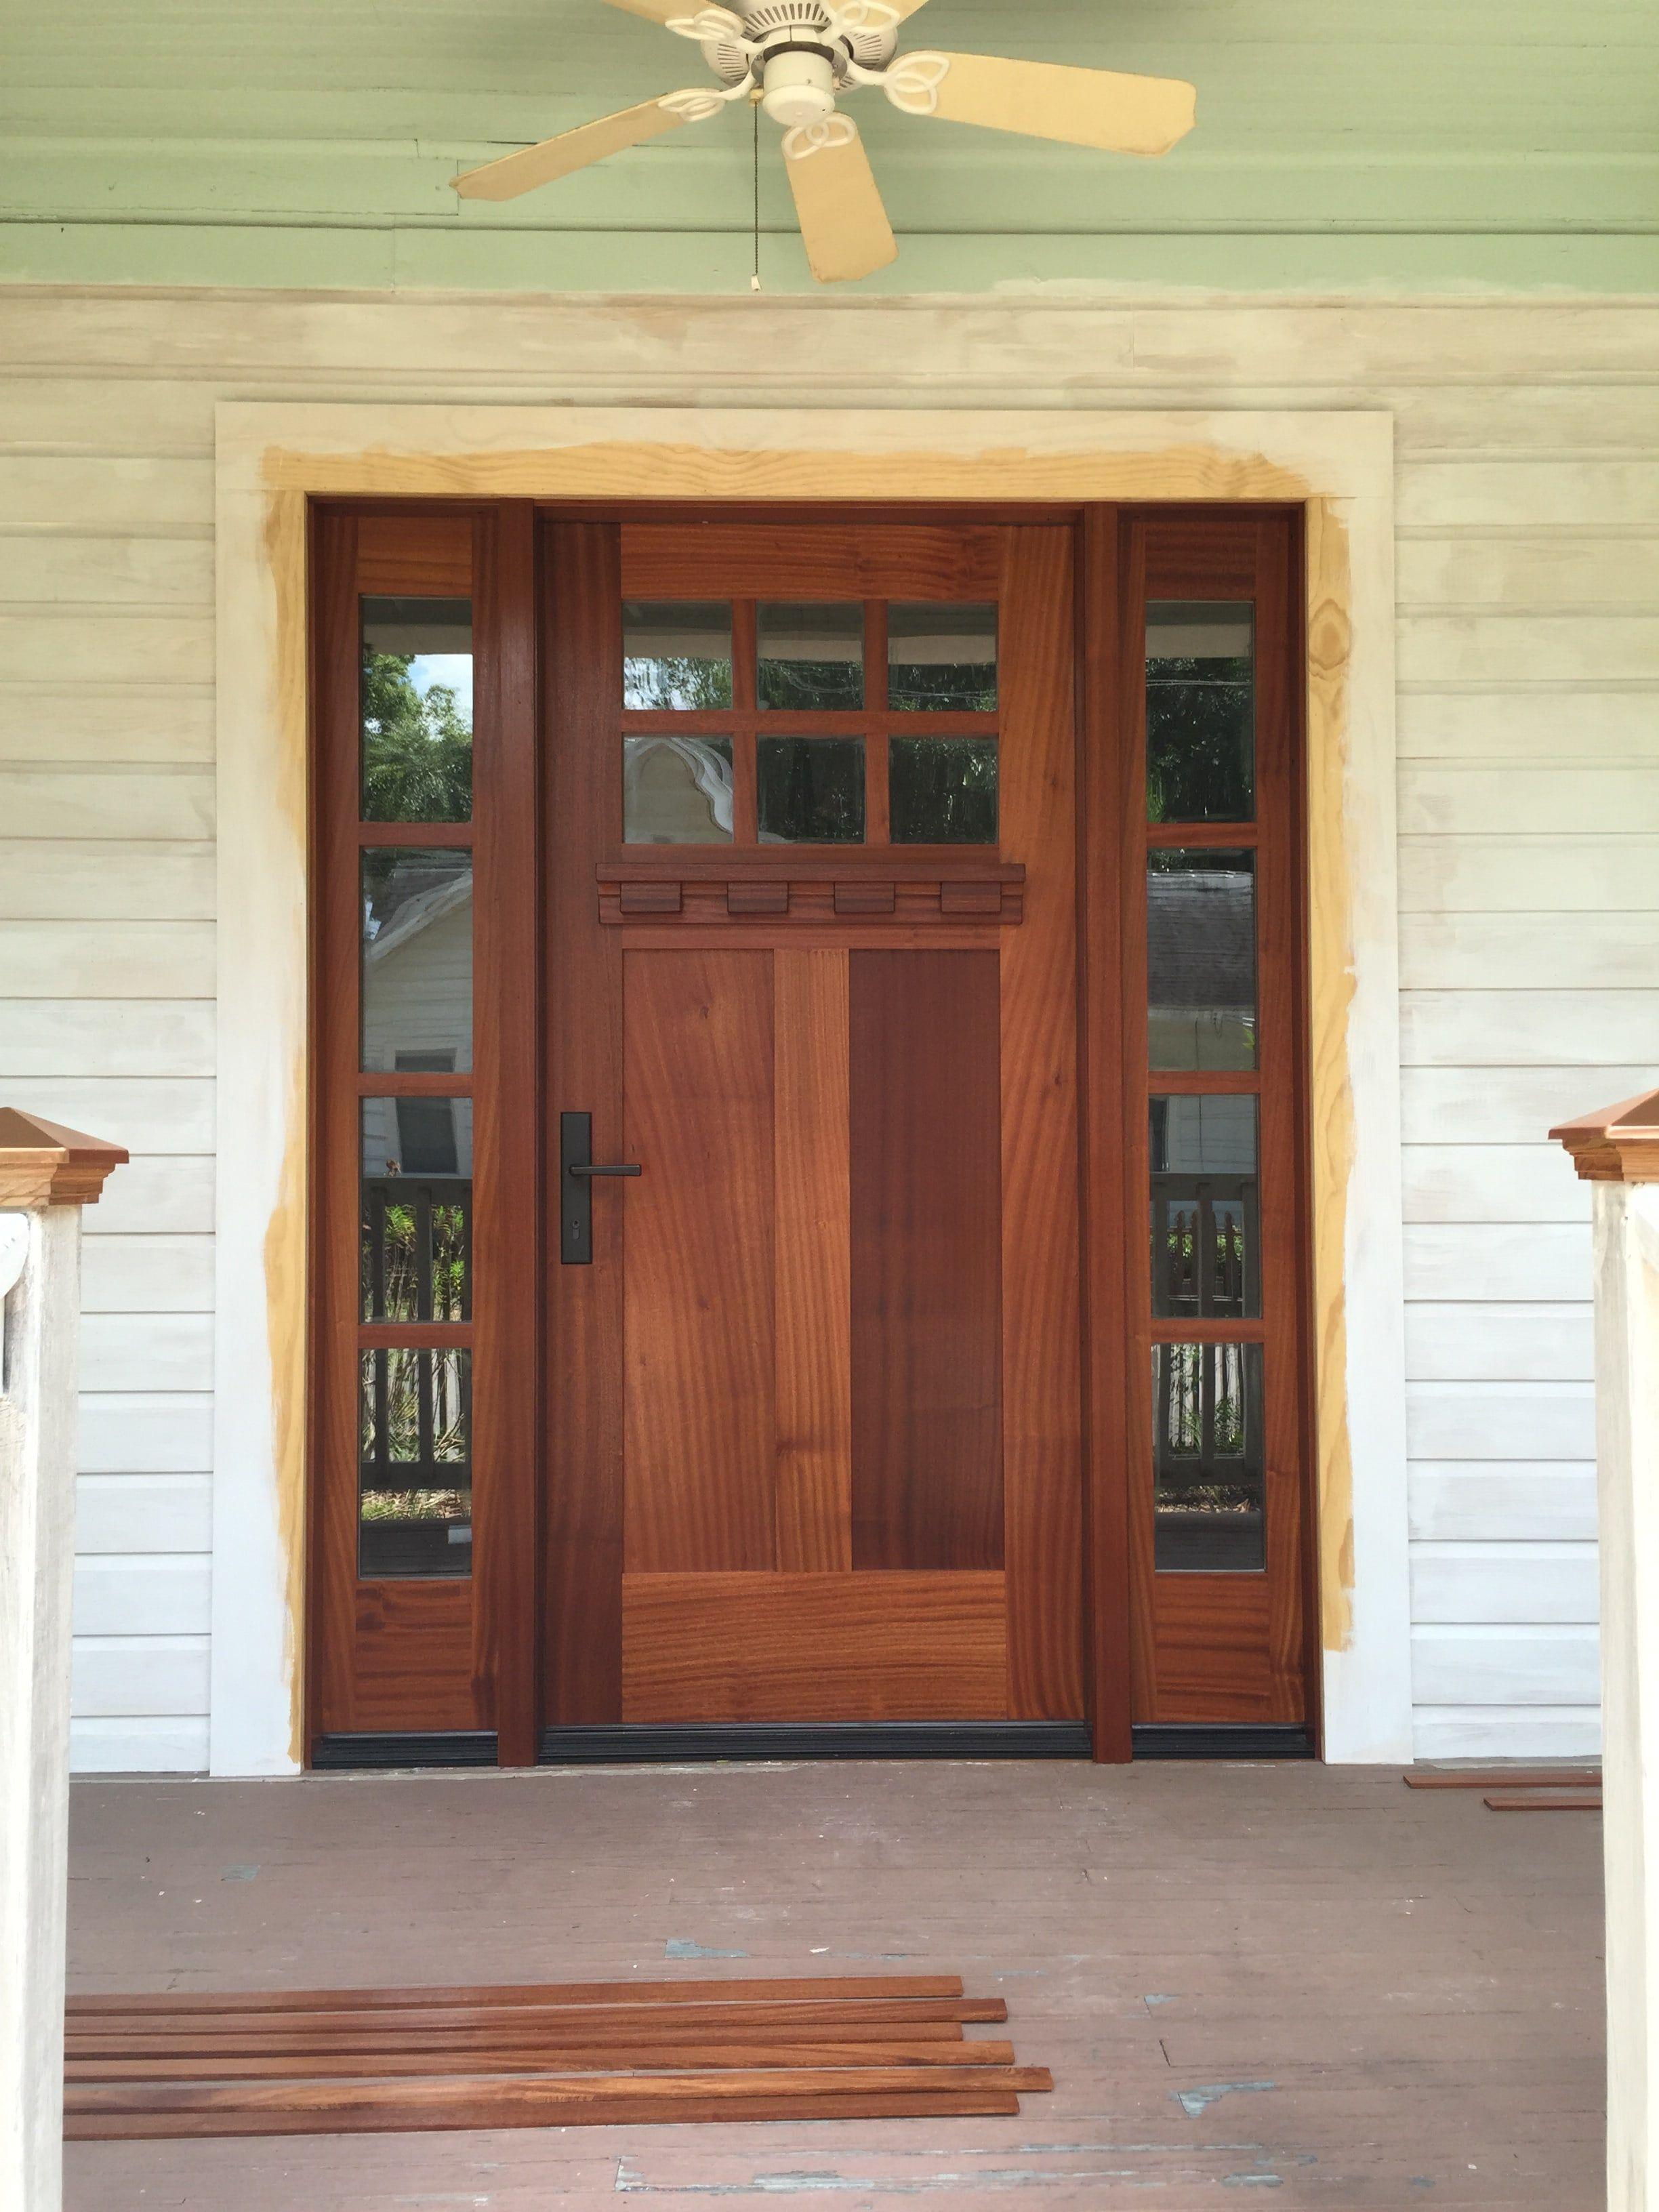 kitchen entry doors glad trash bags heckard s door foursquare exterior